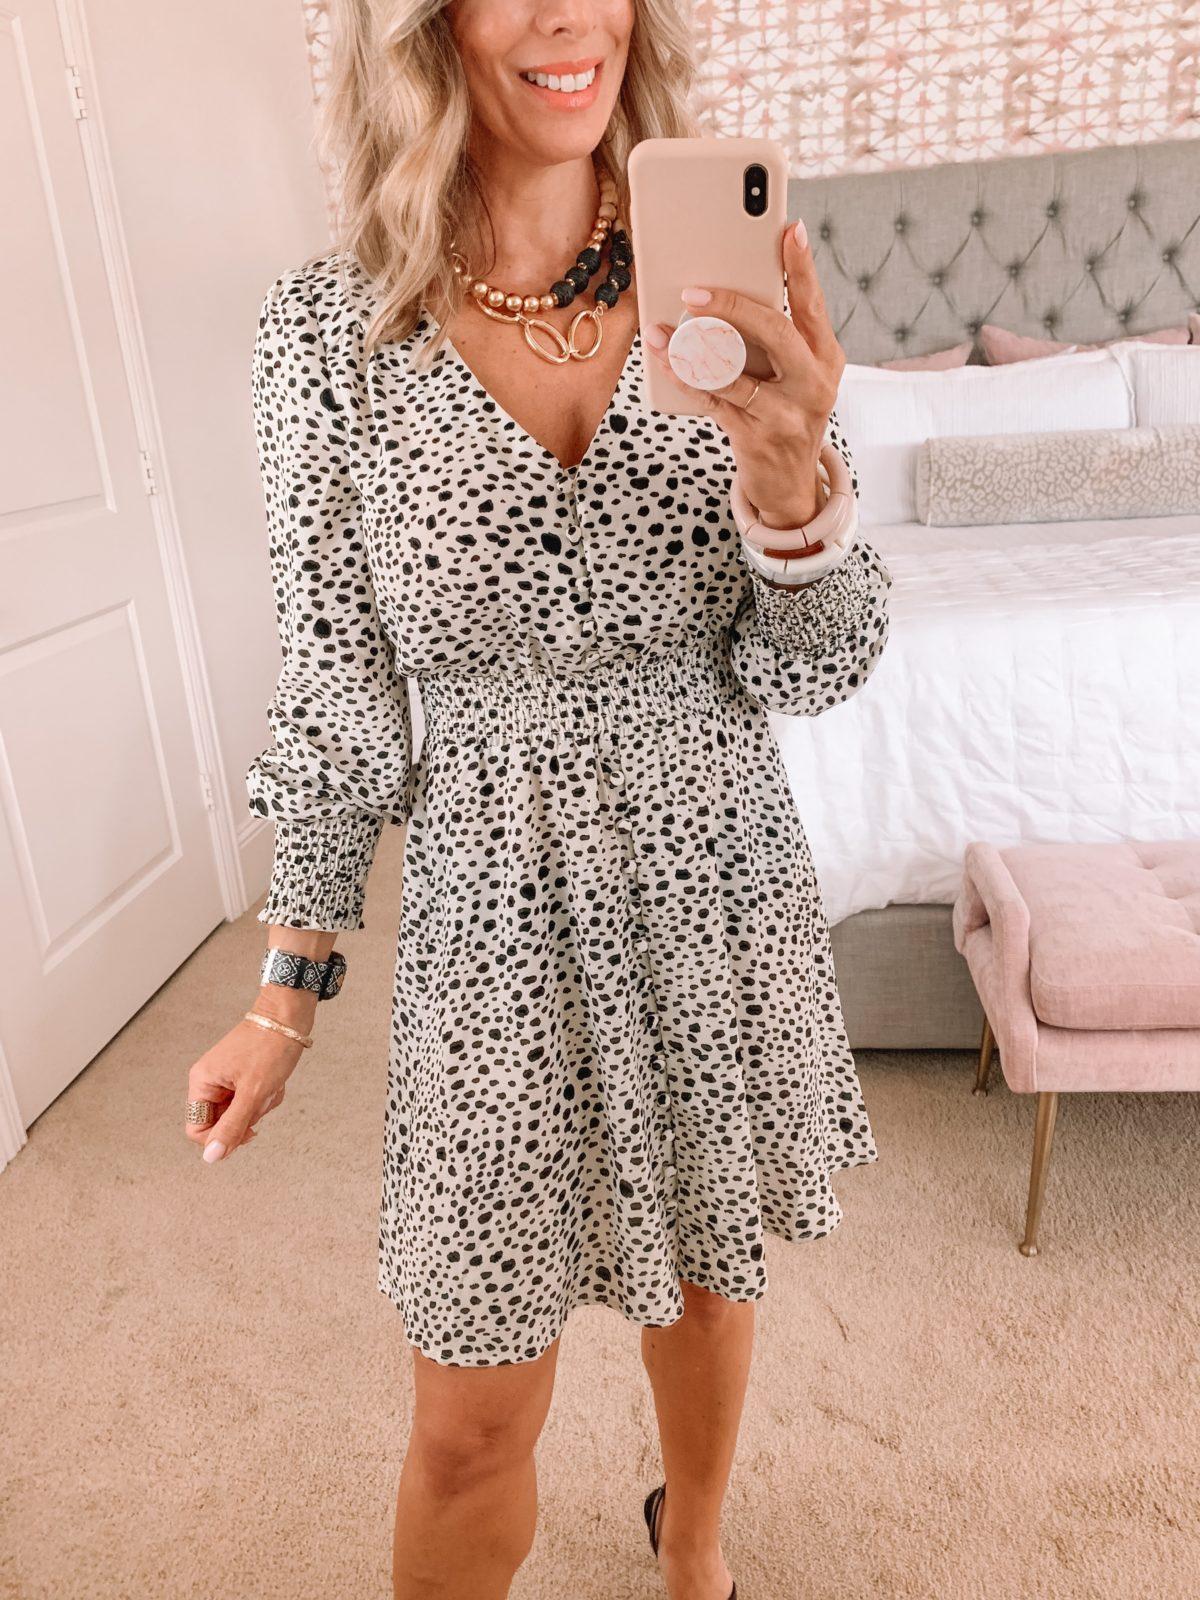 Dressing Room Finds, Leopard Dot Long Sleeve Mini Dress, Sandals, and Crossbody